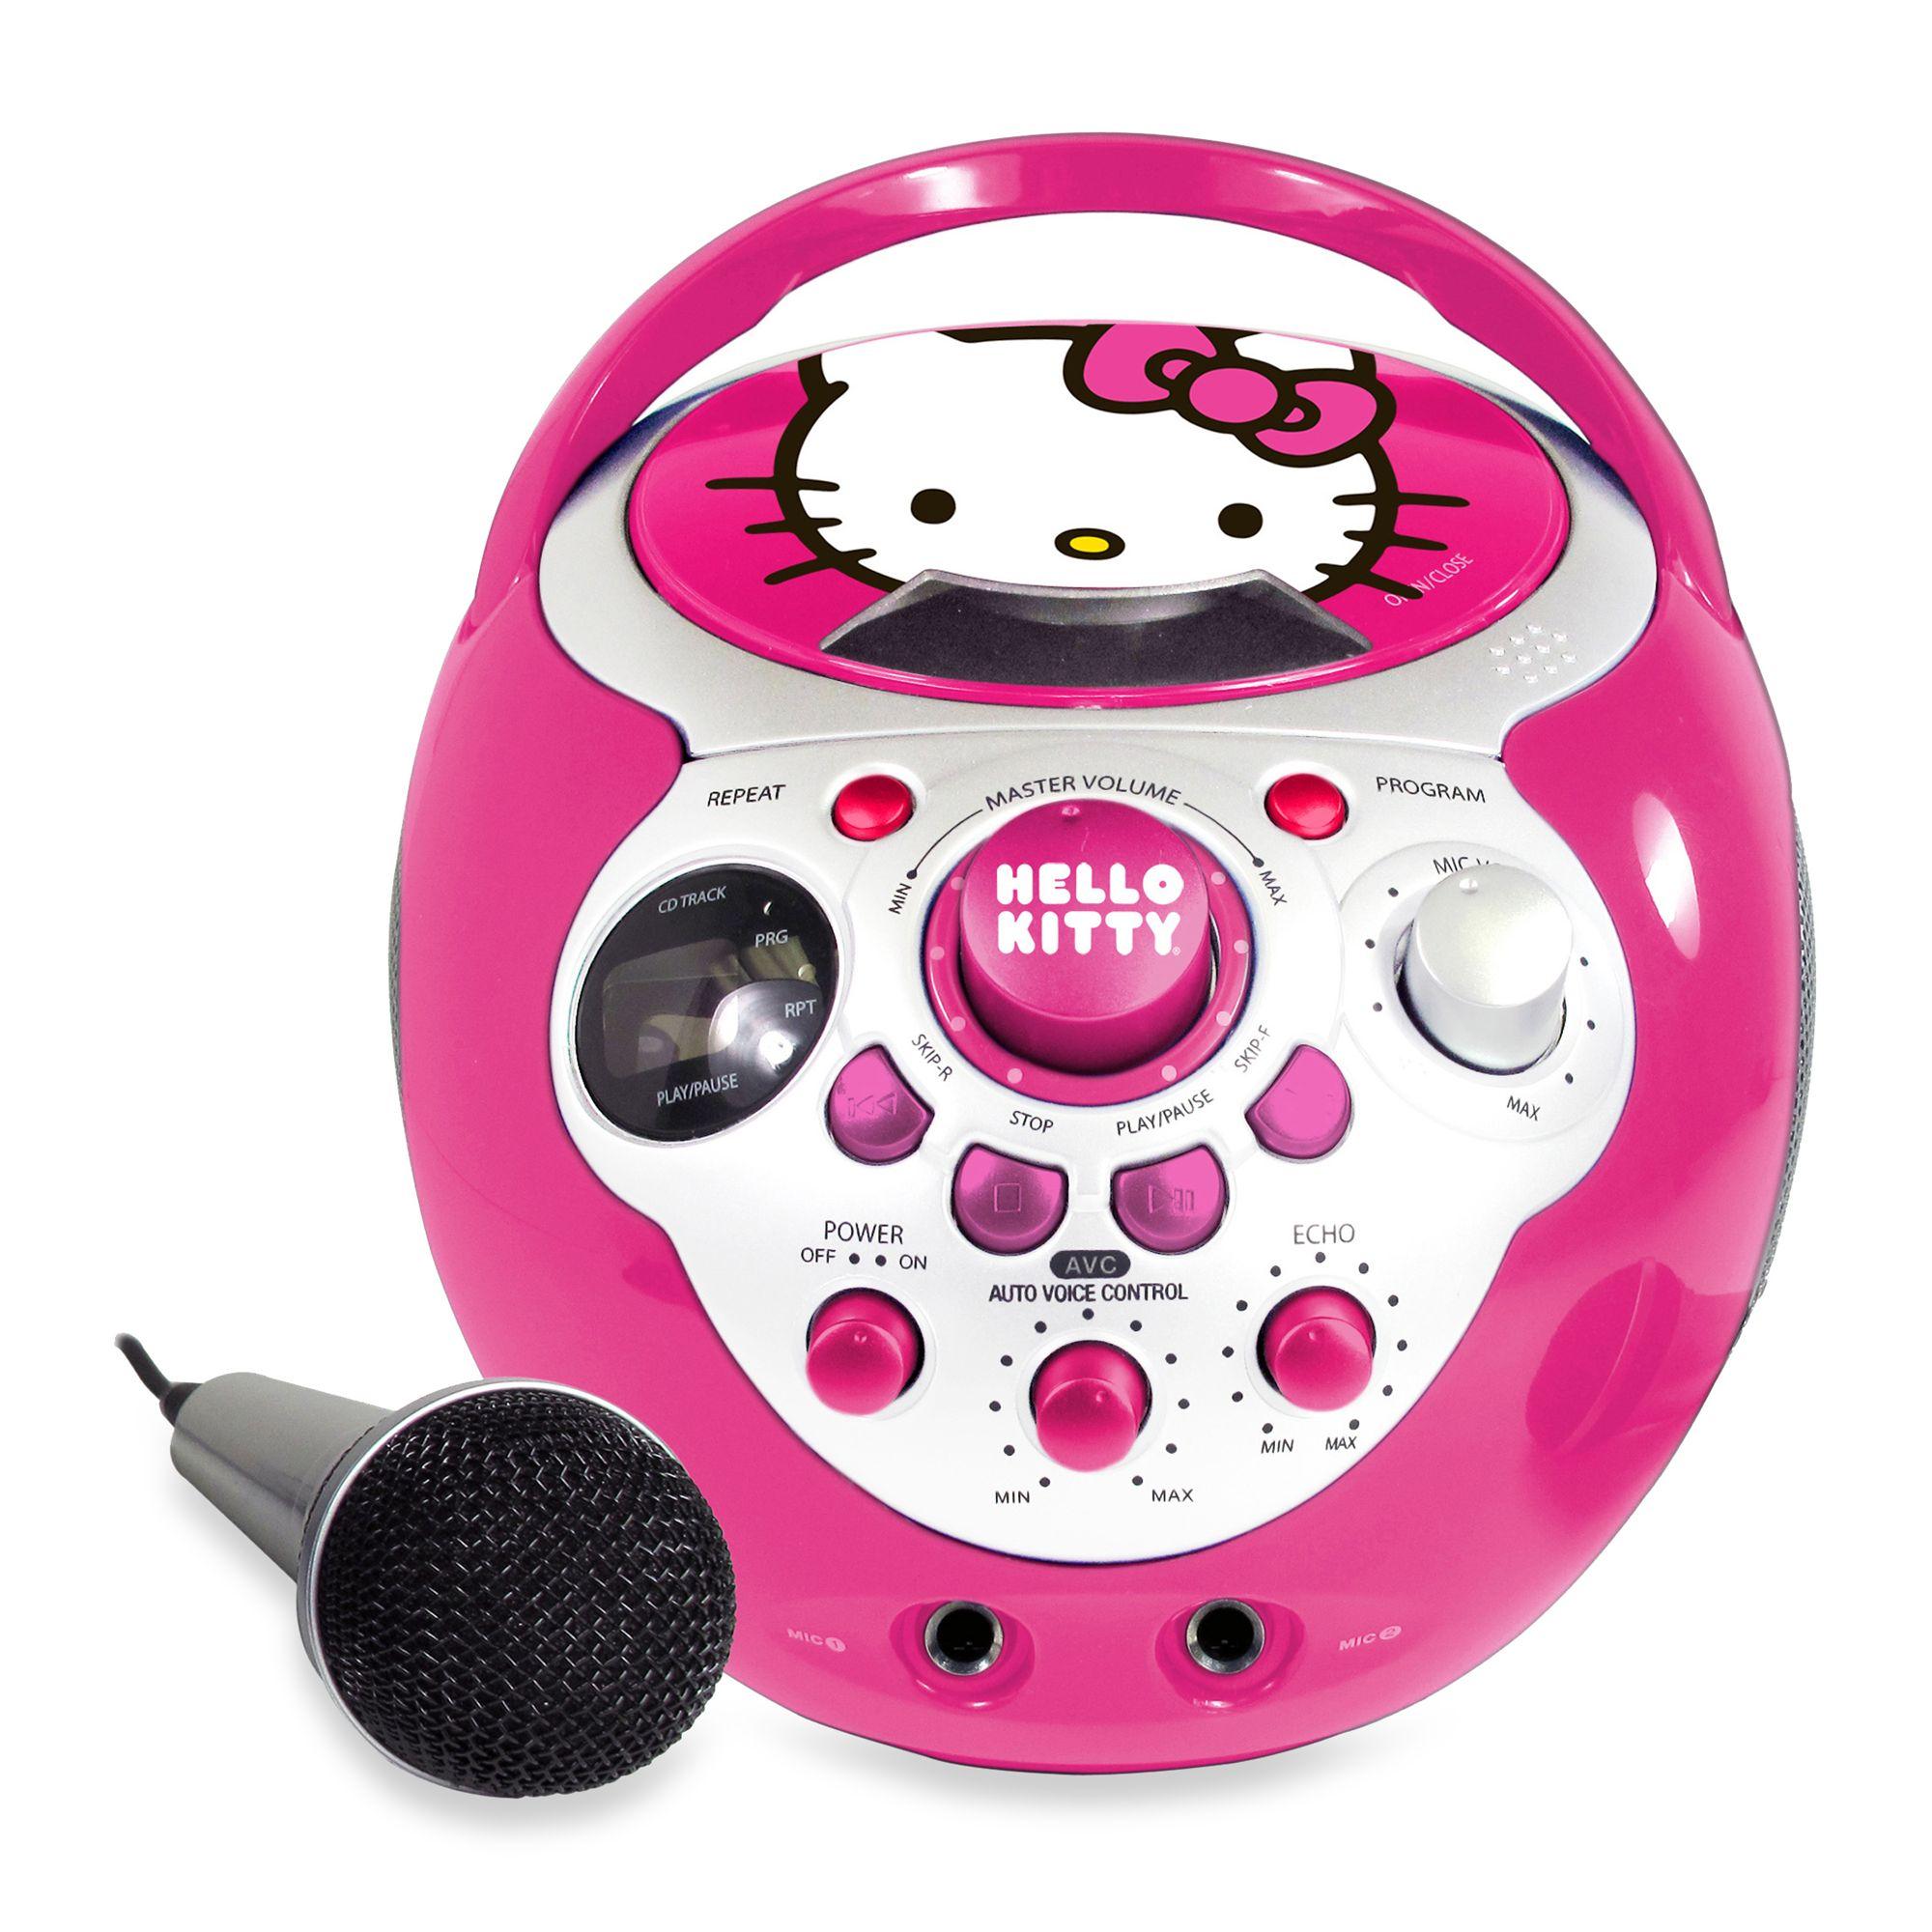 Hello Kitty Karaoke Car Hello Kitty® cd g Mini Karaoke